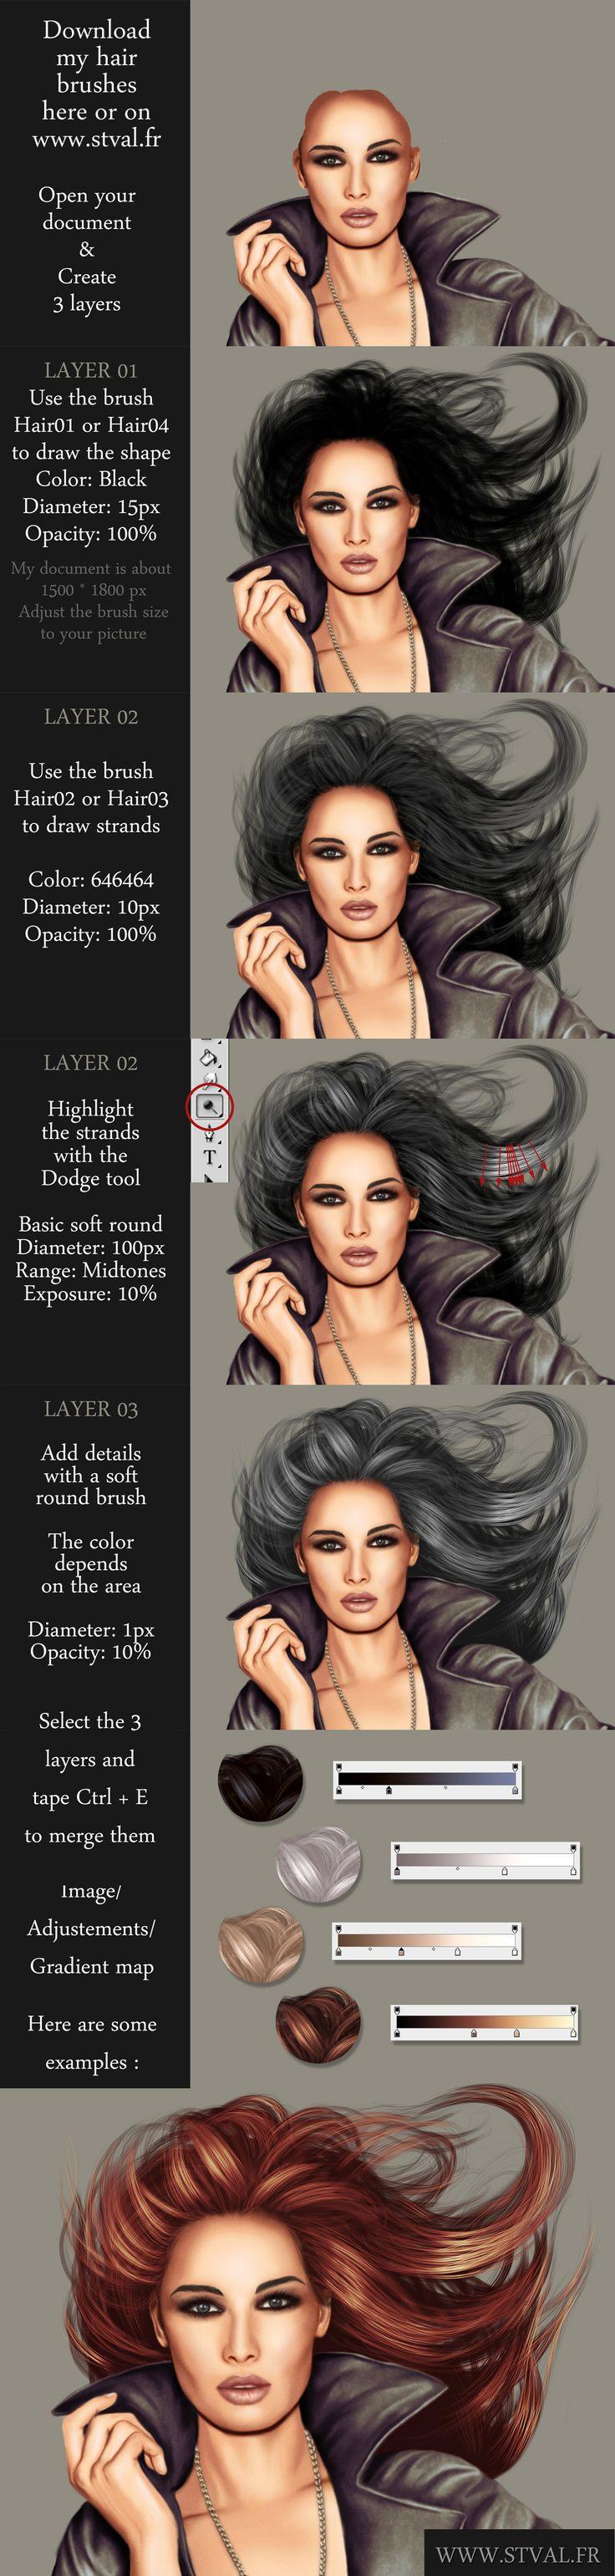 74 best illustration digital art tutorials images on pinterest hair tutorial with brushes by stephanievalentin on deviantart digital painting baditri Image collections